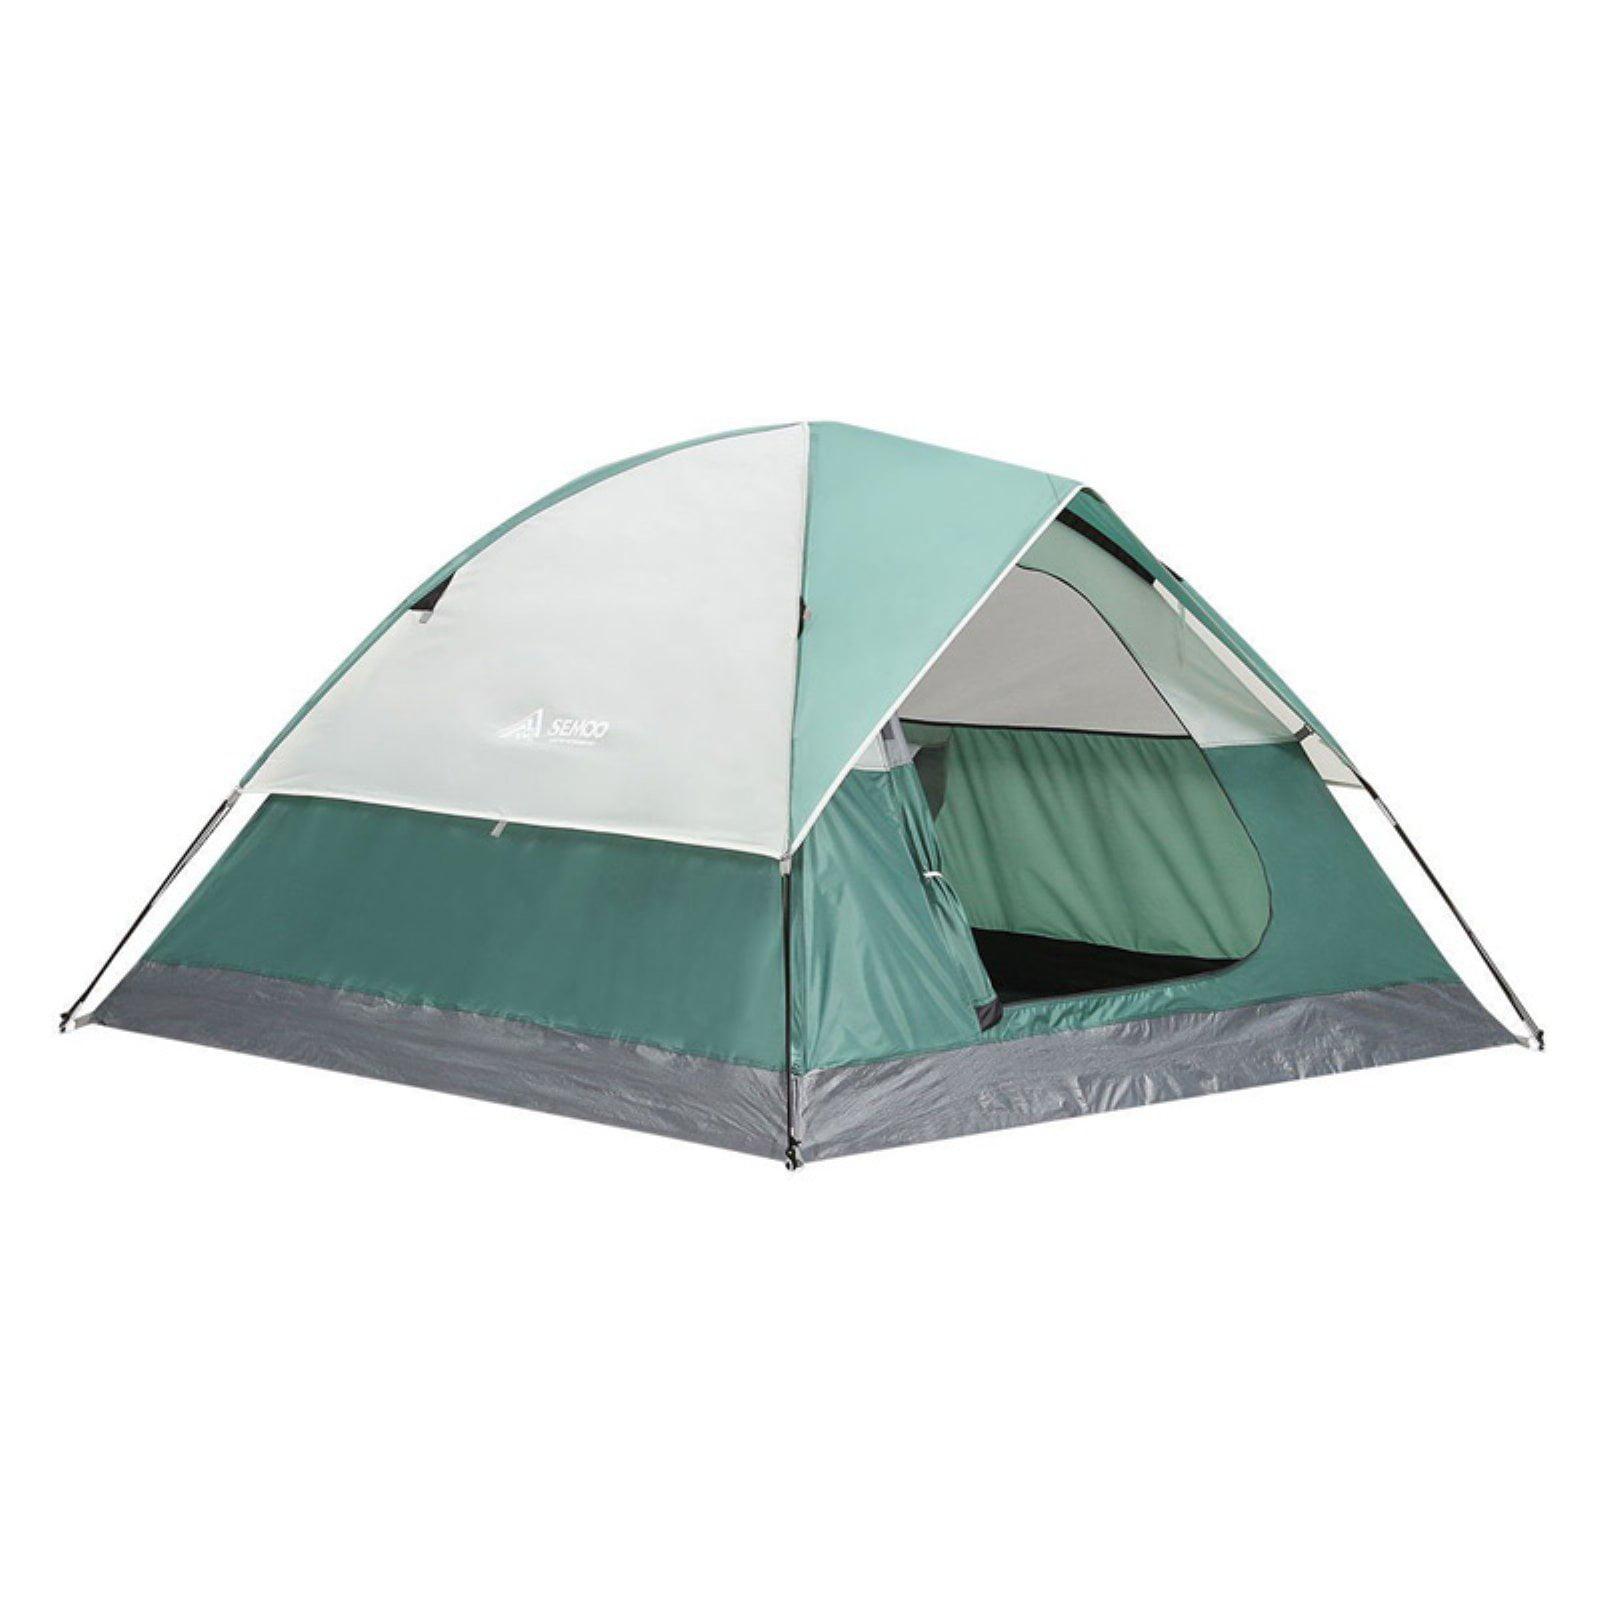 Semoo 3 Person Family 3 Season Camping Tent With Carry Bag Walmart Com Walmart Com